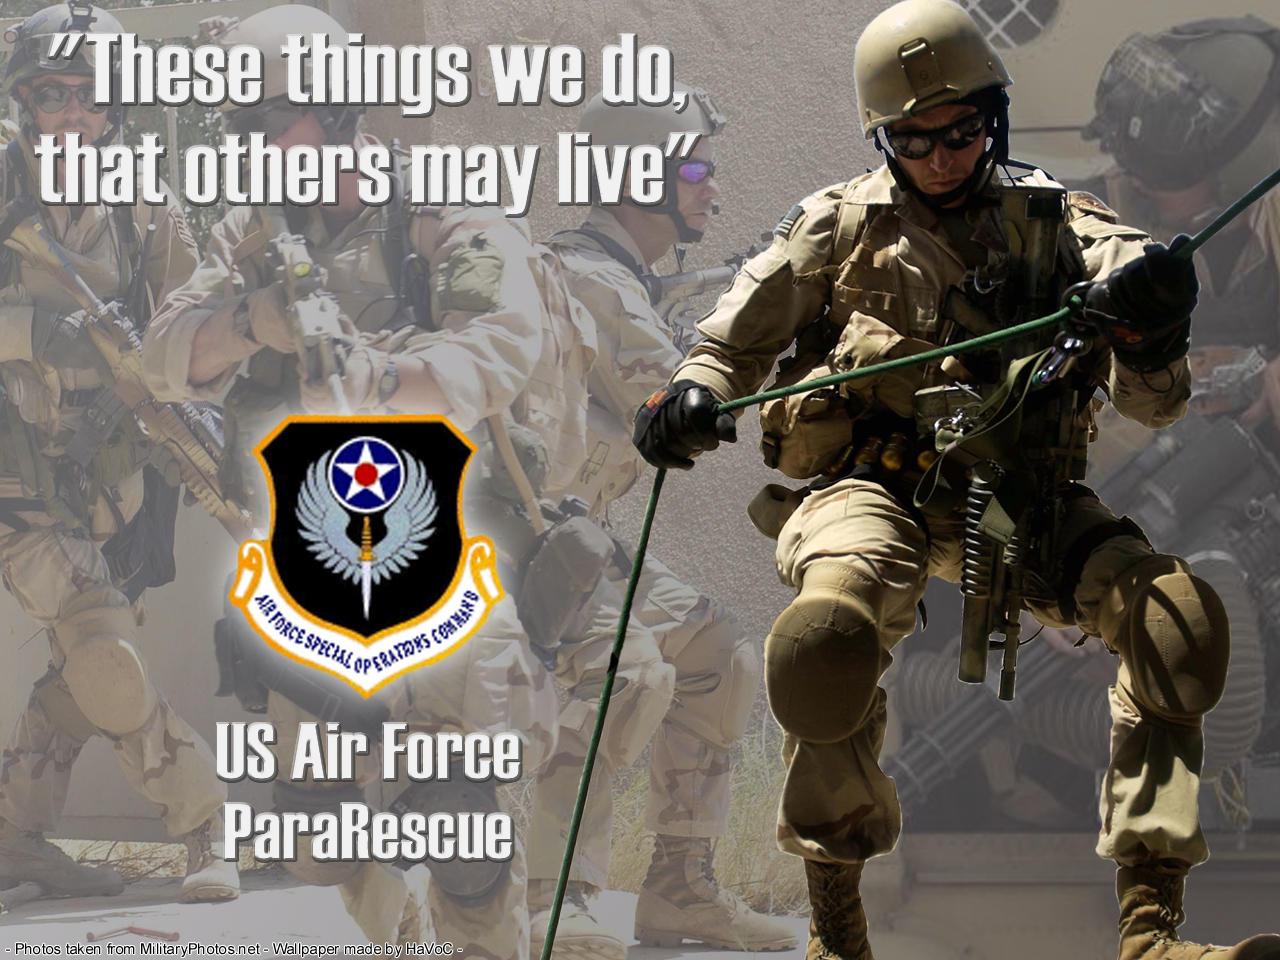 USAF ParaRescue by HaVoCMaN on DeviantArt Usaf Pararescue Wallpaper